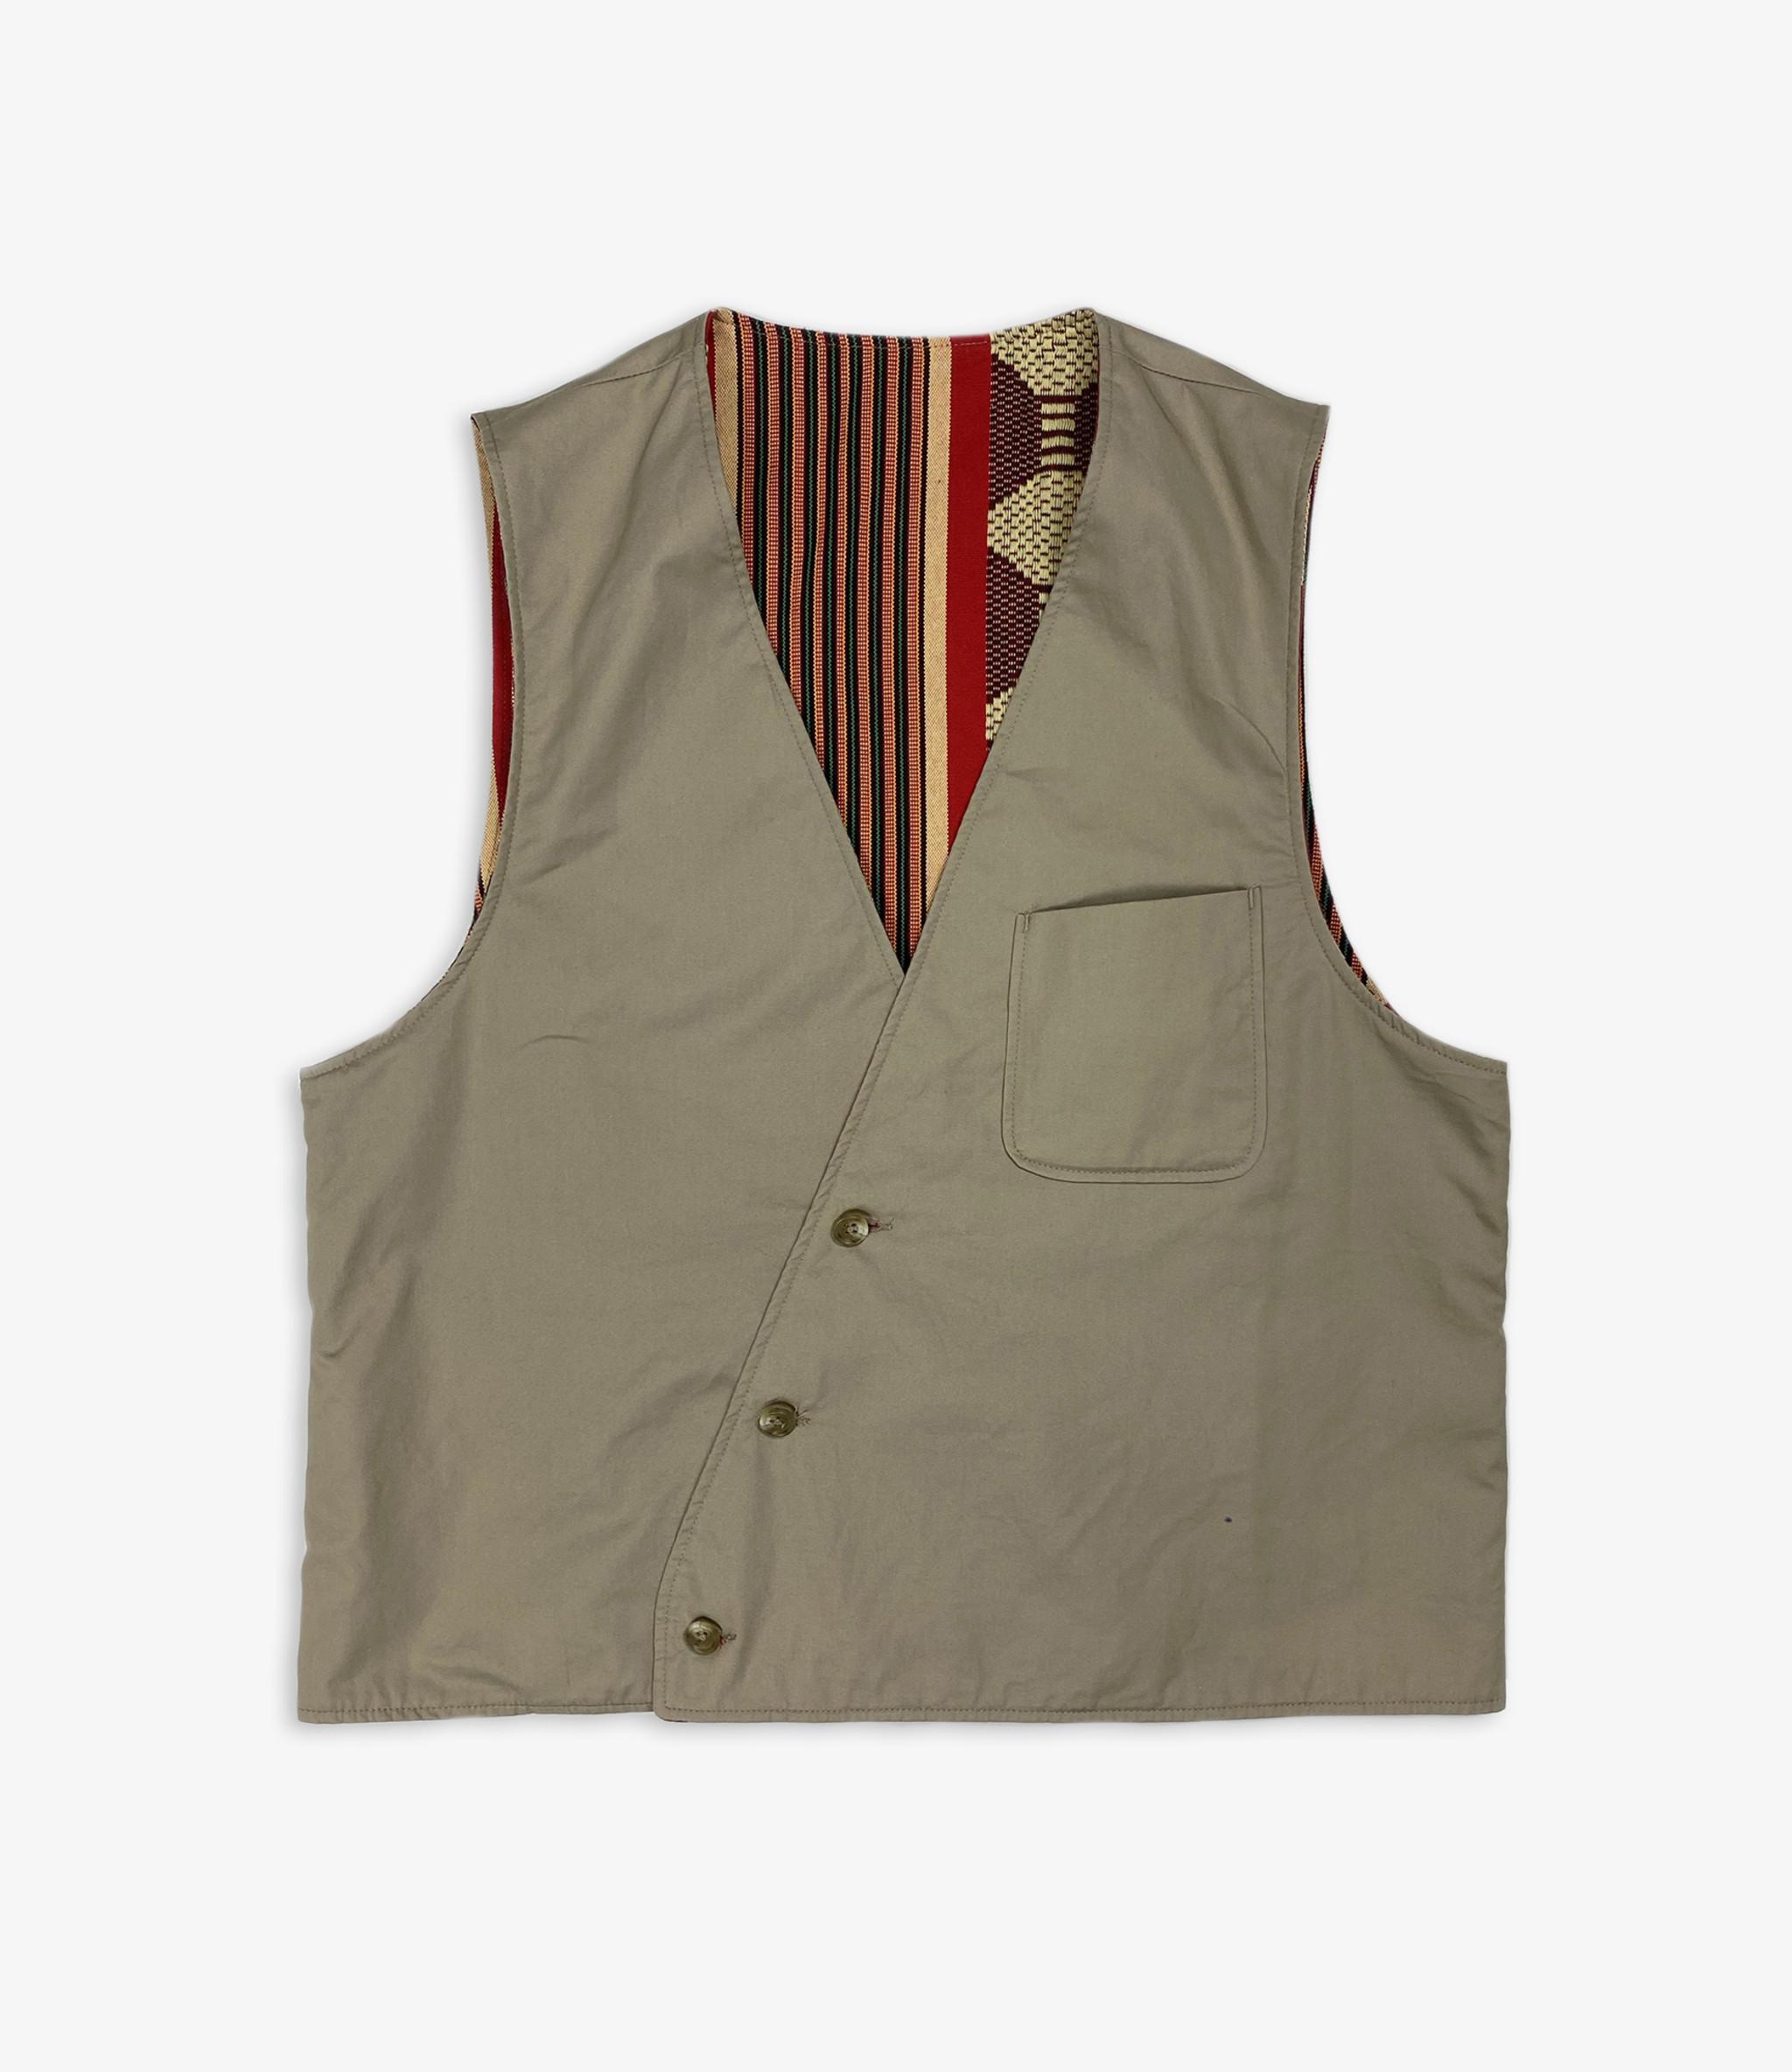 Reversible Vest - Khaki High Count Twill